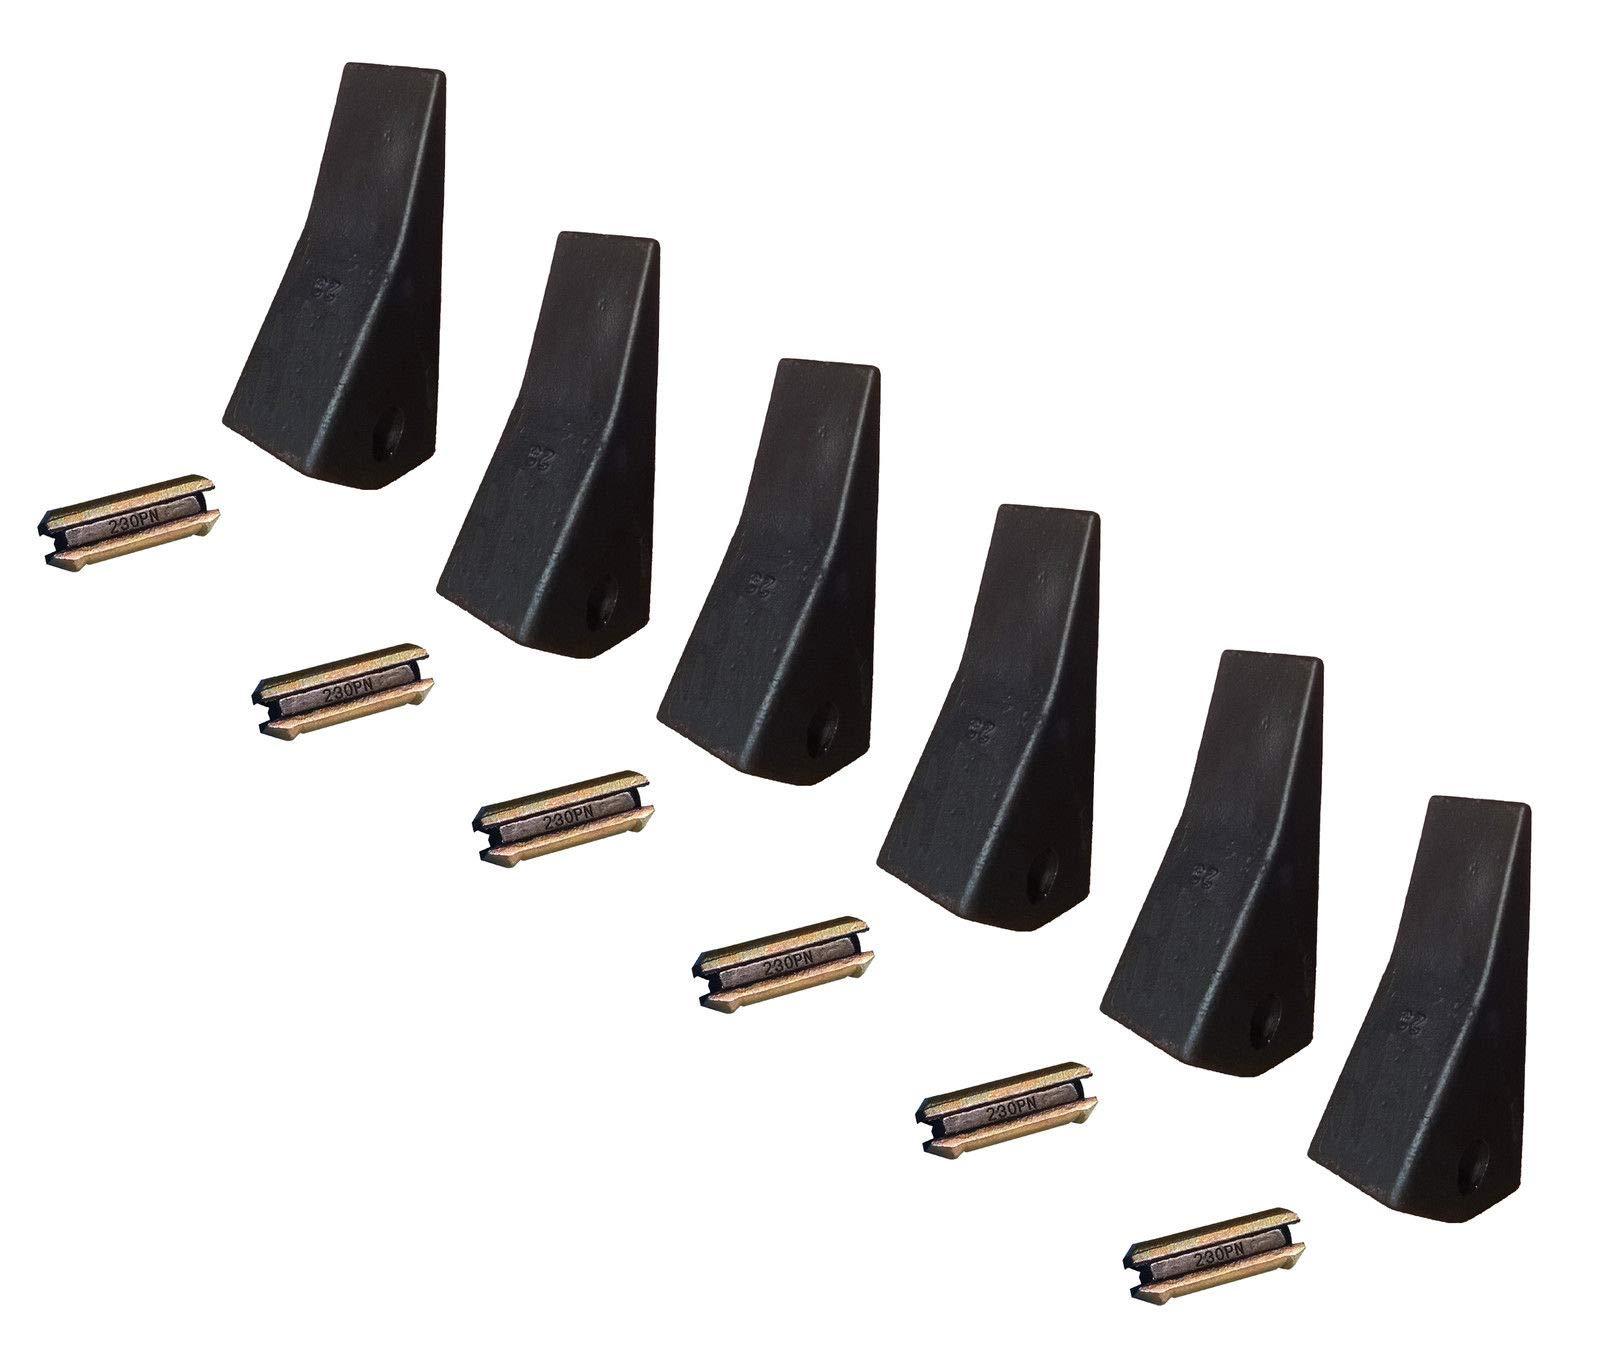 230 Backhoe // Skid Bucket Tooth 230S, 230HX 230HXL 4 23